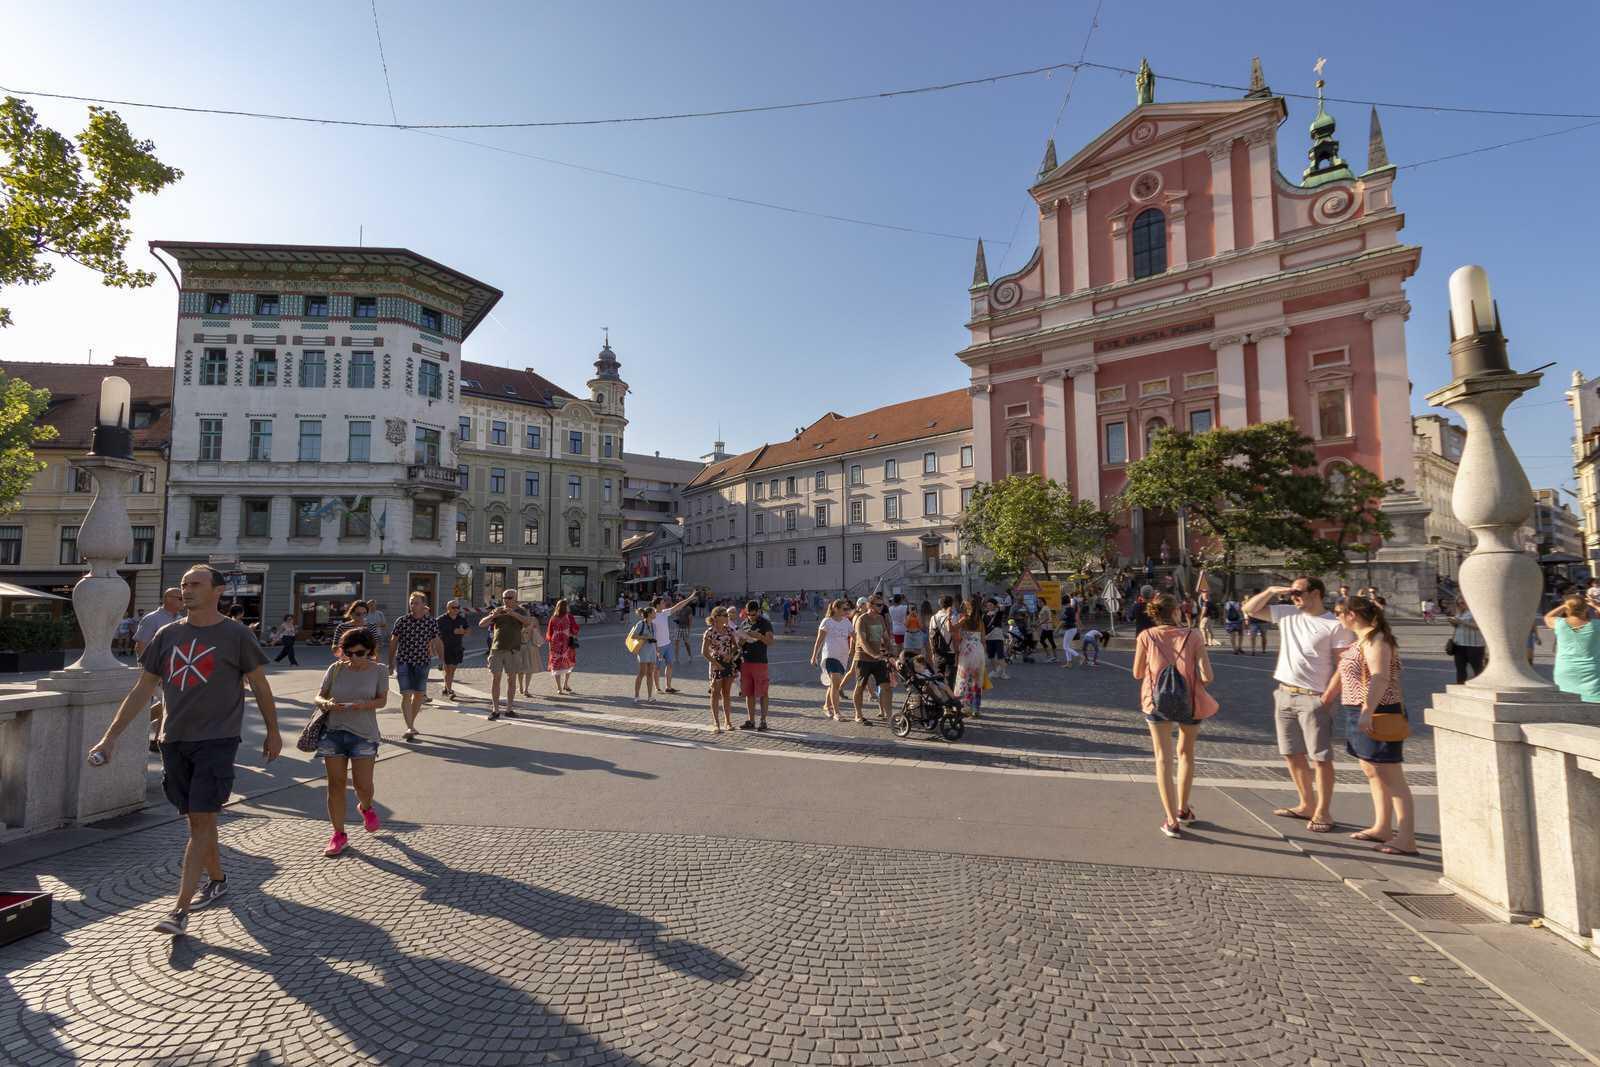 2-bedroom apartment Ljubljana Beethovnova is only 6 minutes from the main Prešeren square